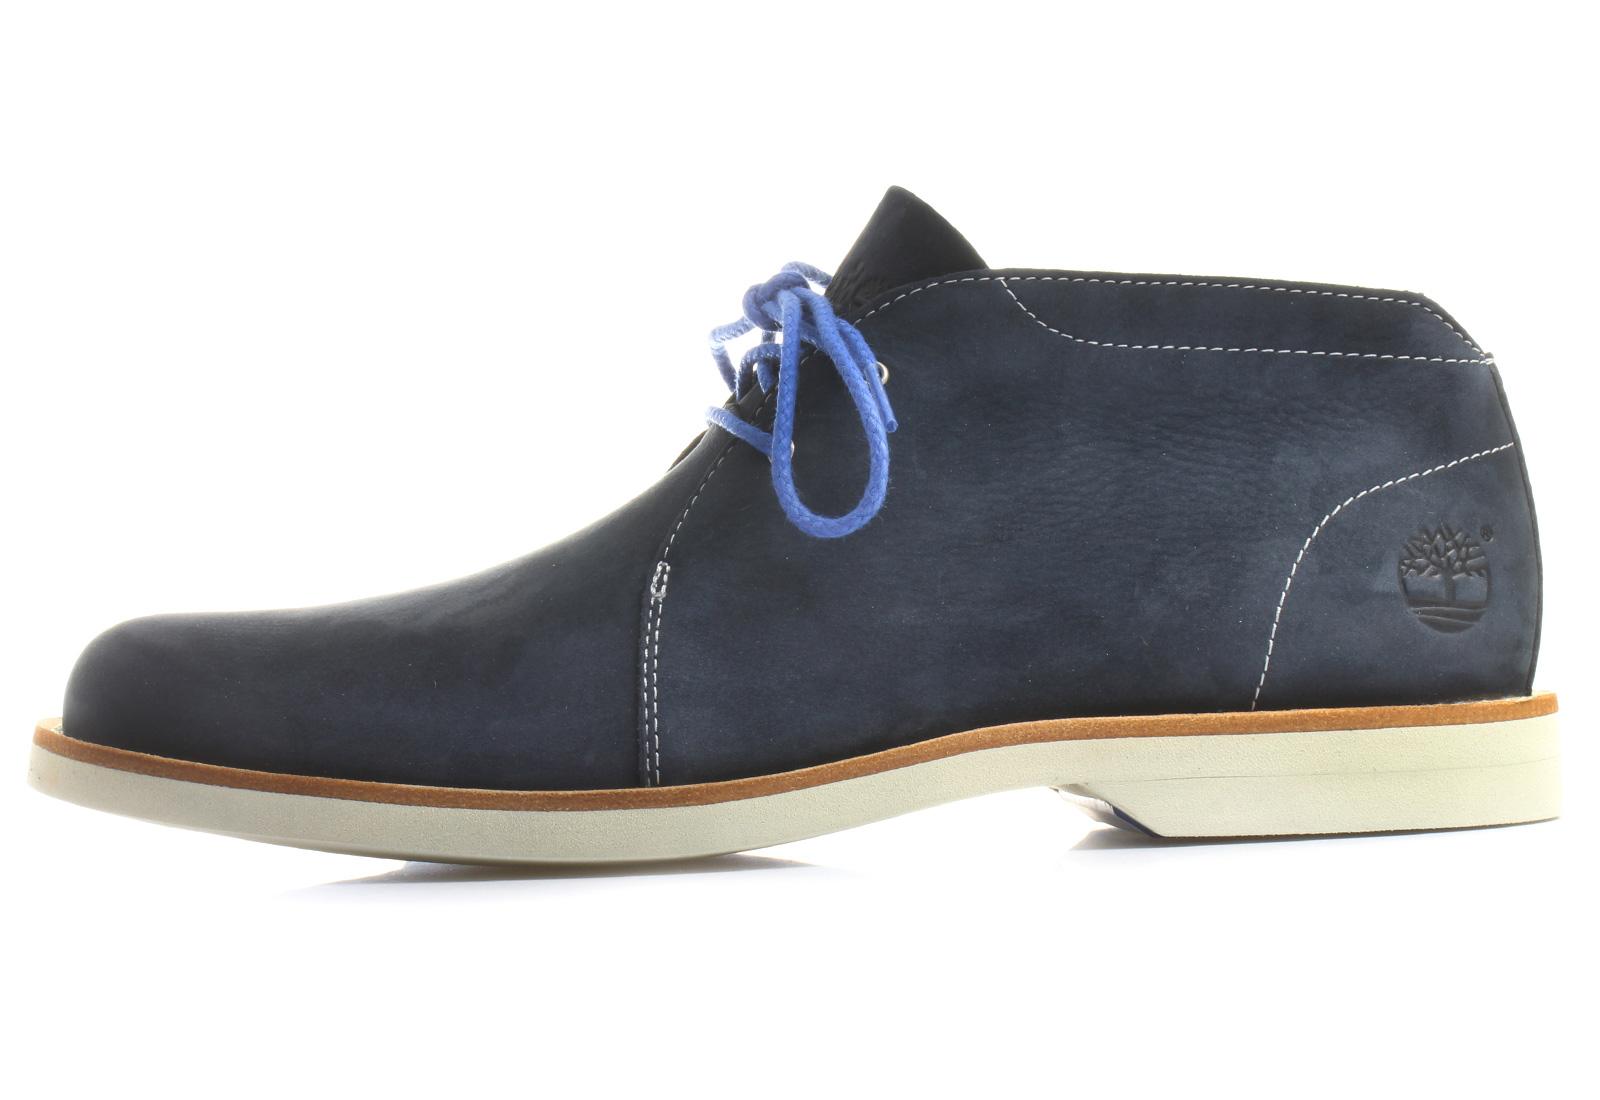 timberland stormbuck chukka boots